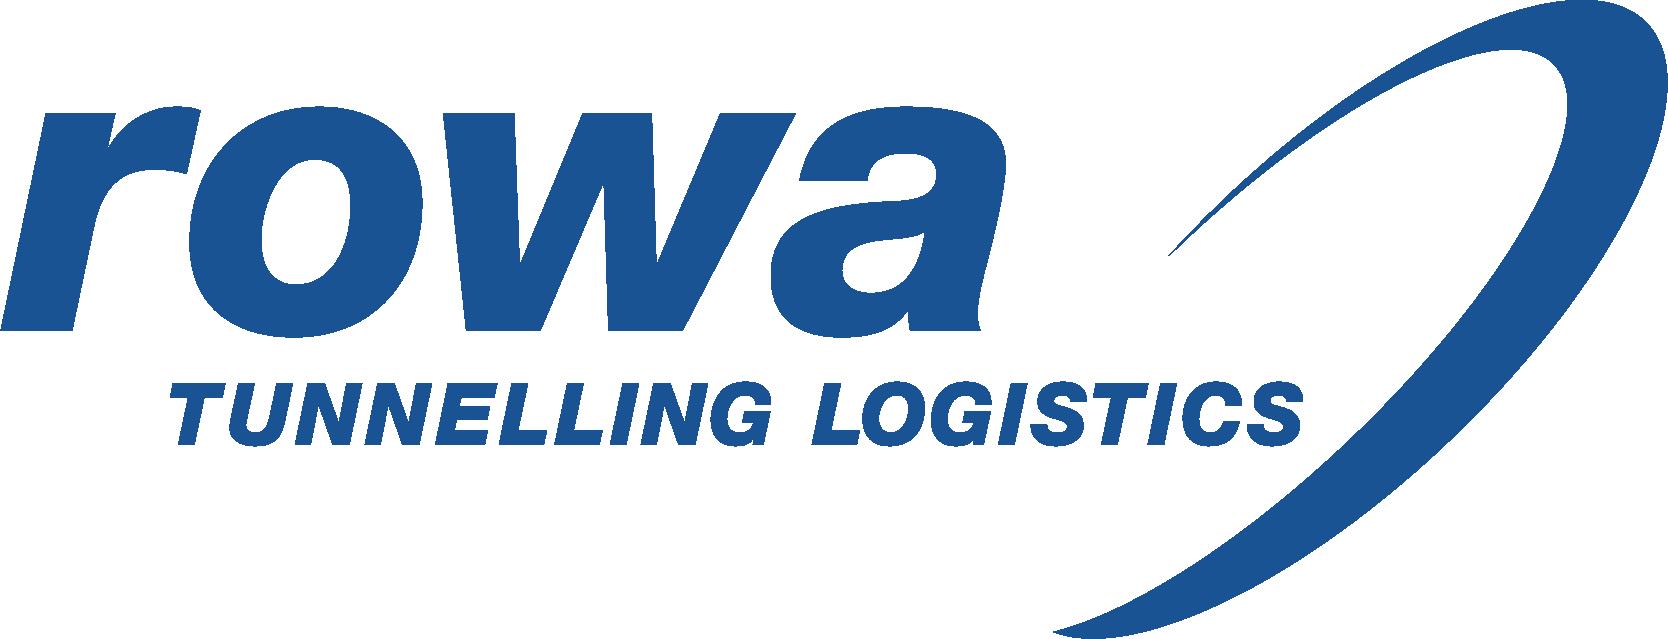 Rowa Tunnelling Logistics AG Logo